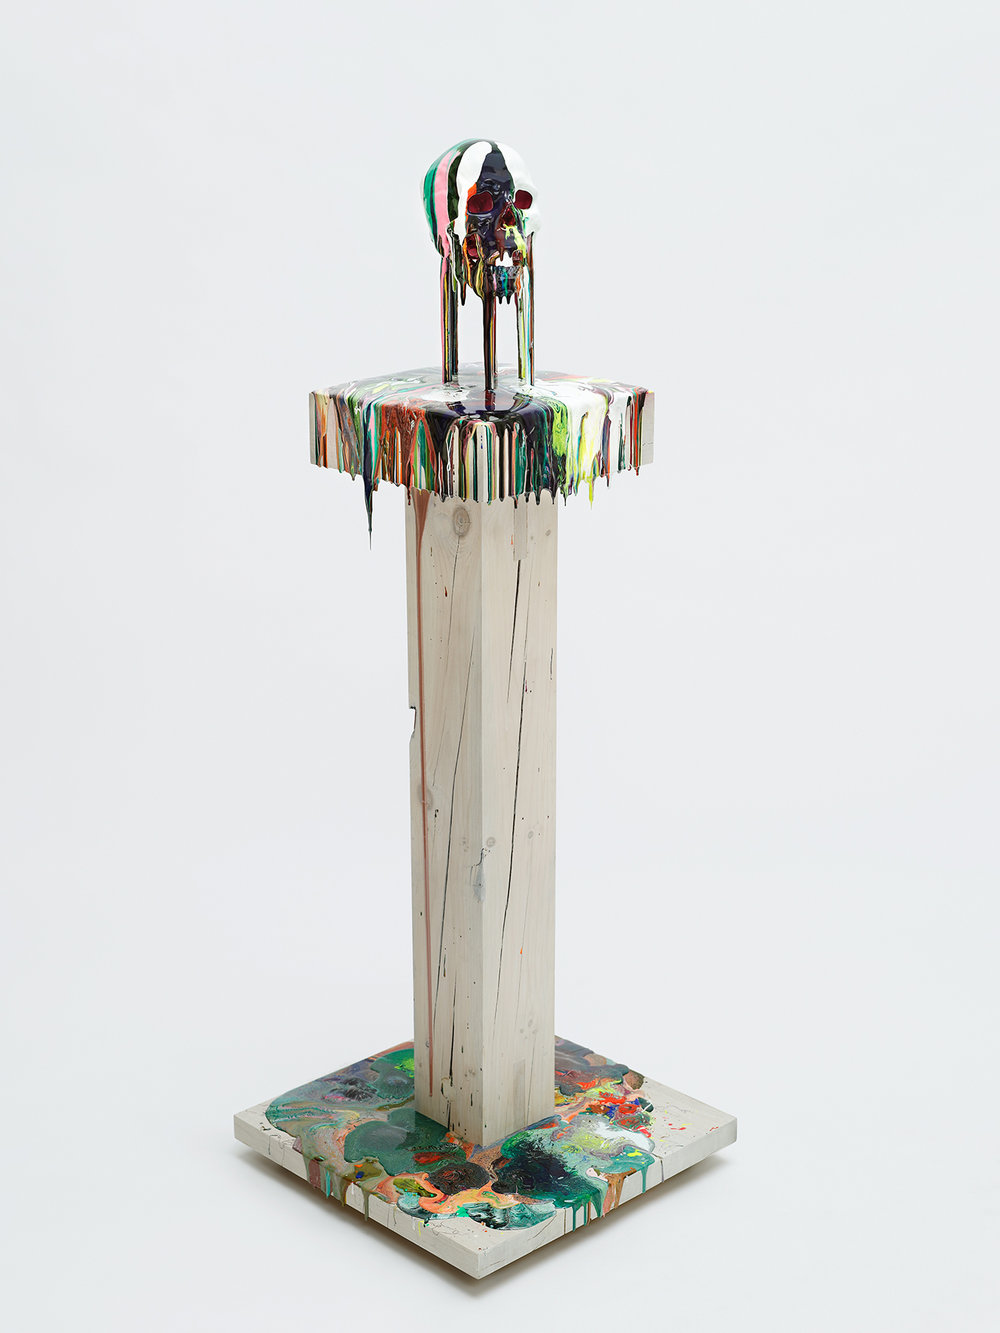 SKULL7(MOMENTARY), 2012